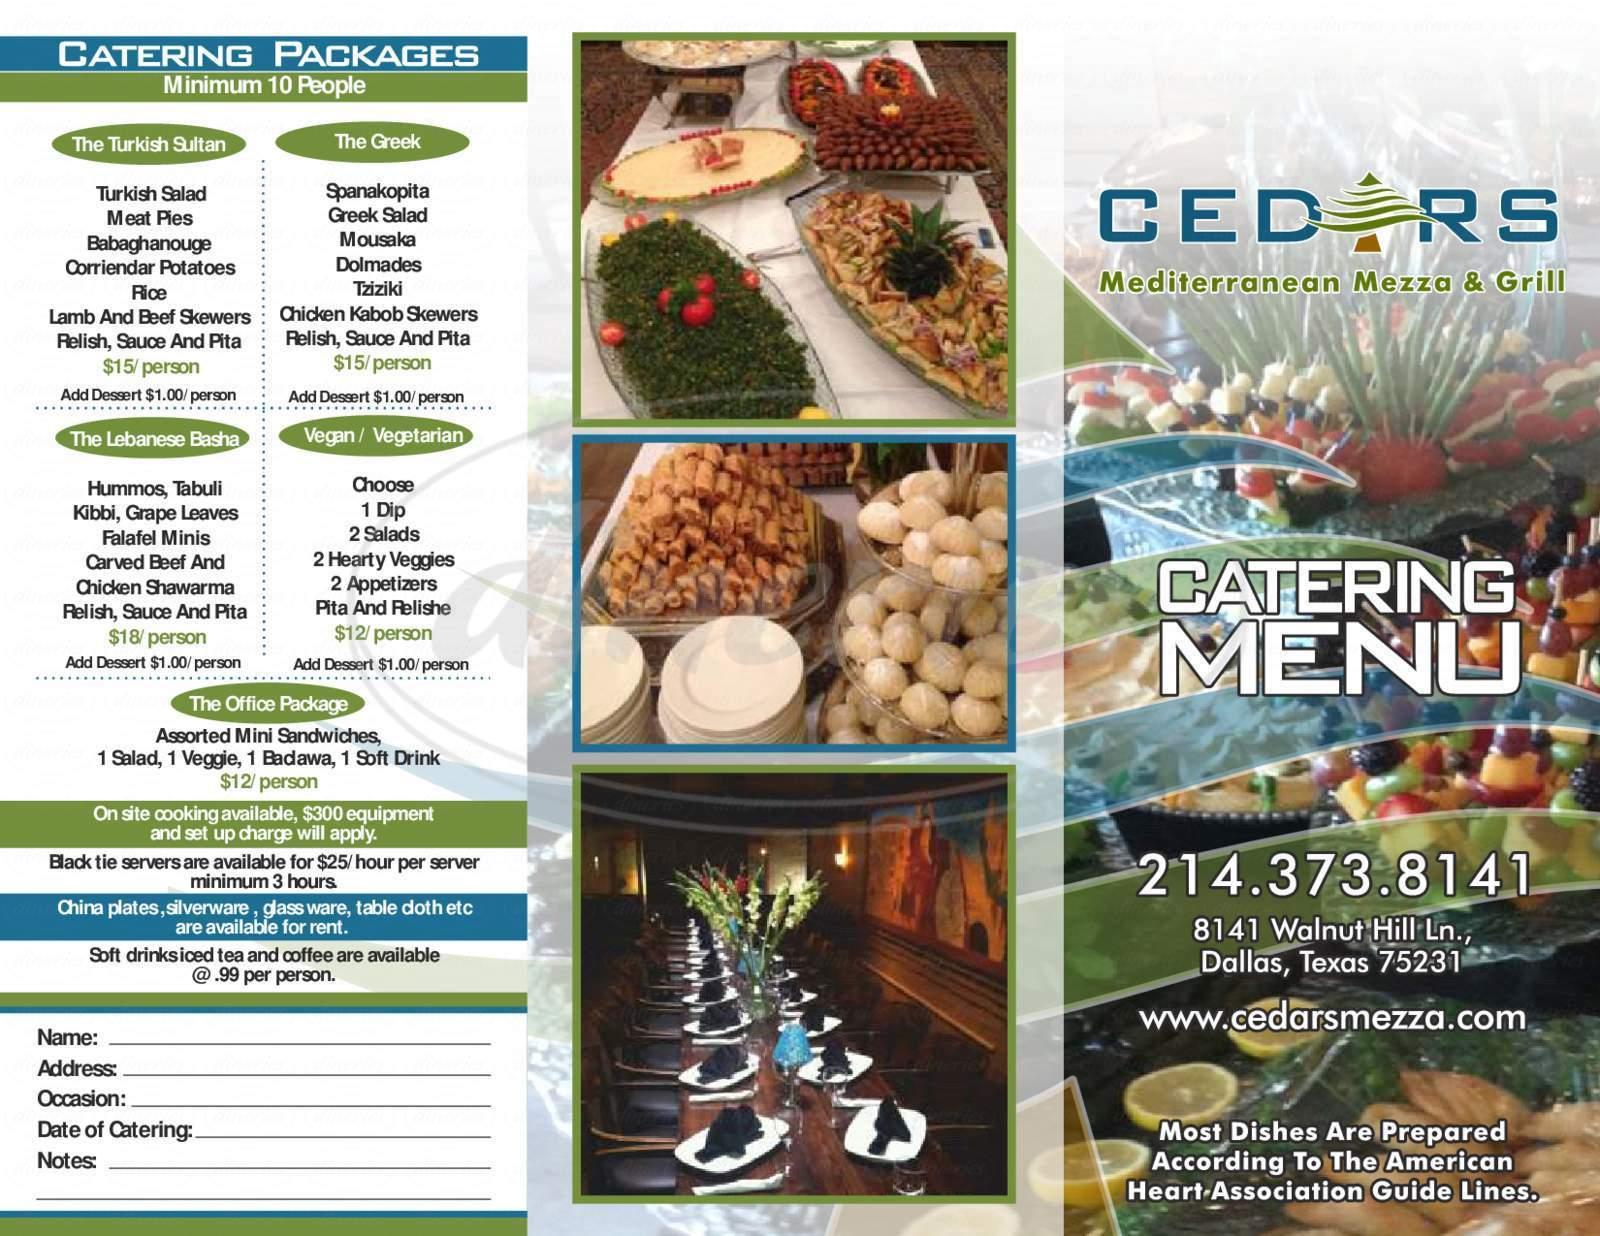 menu for Cedars Mediterranean Mezza & Grill